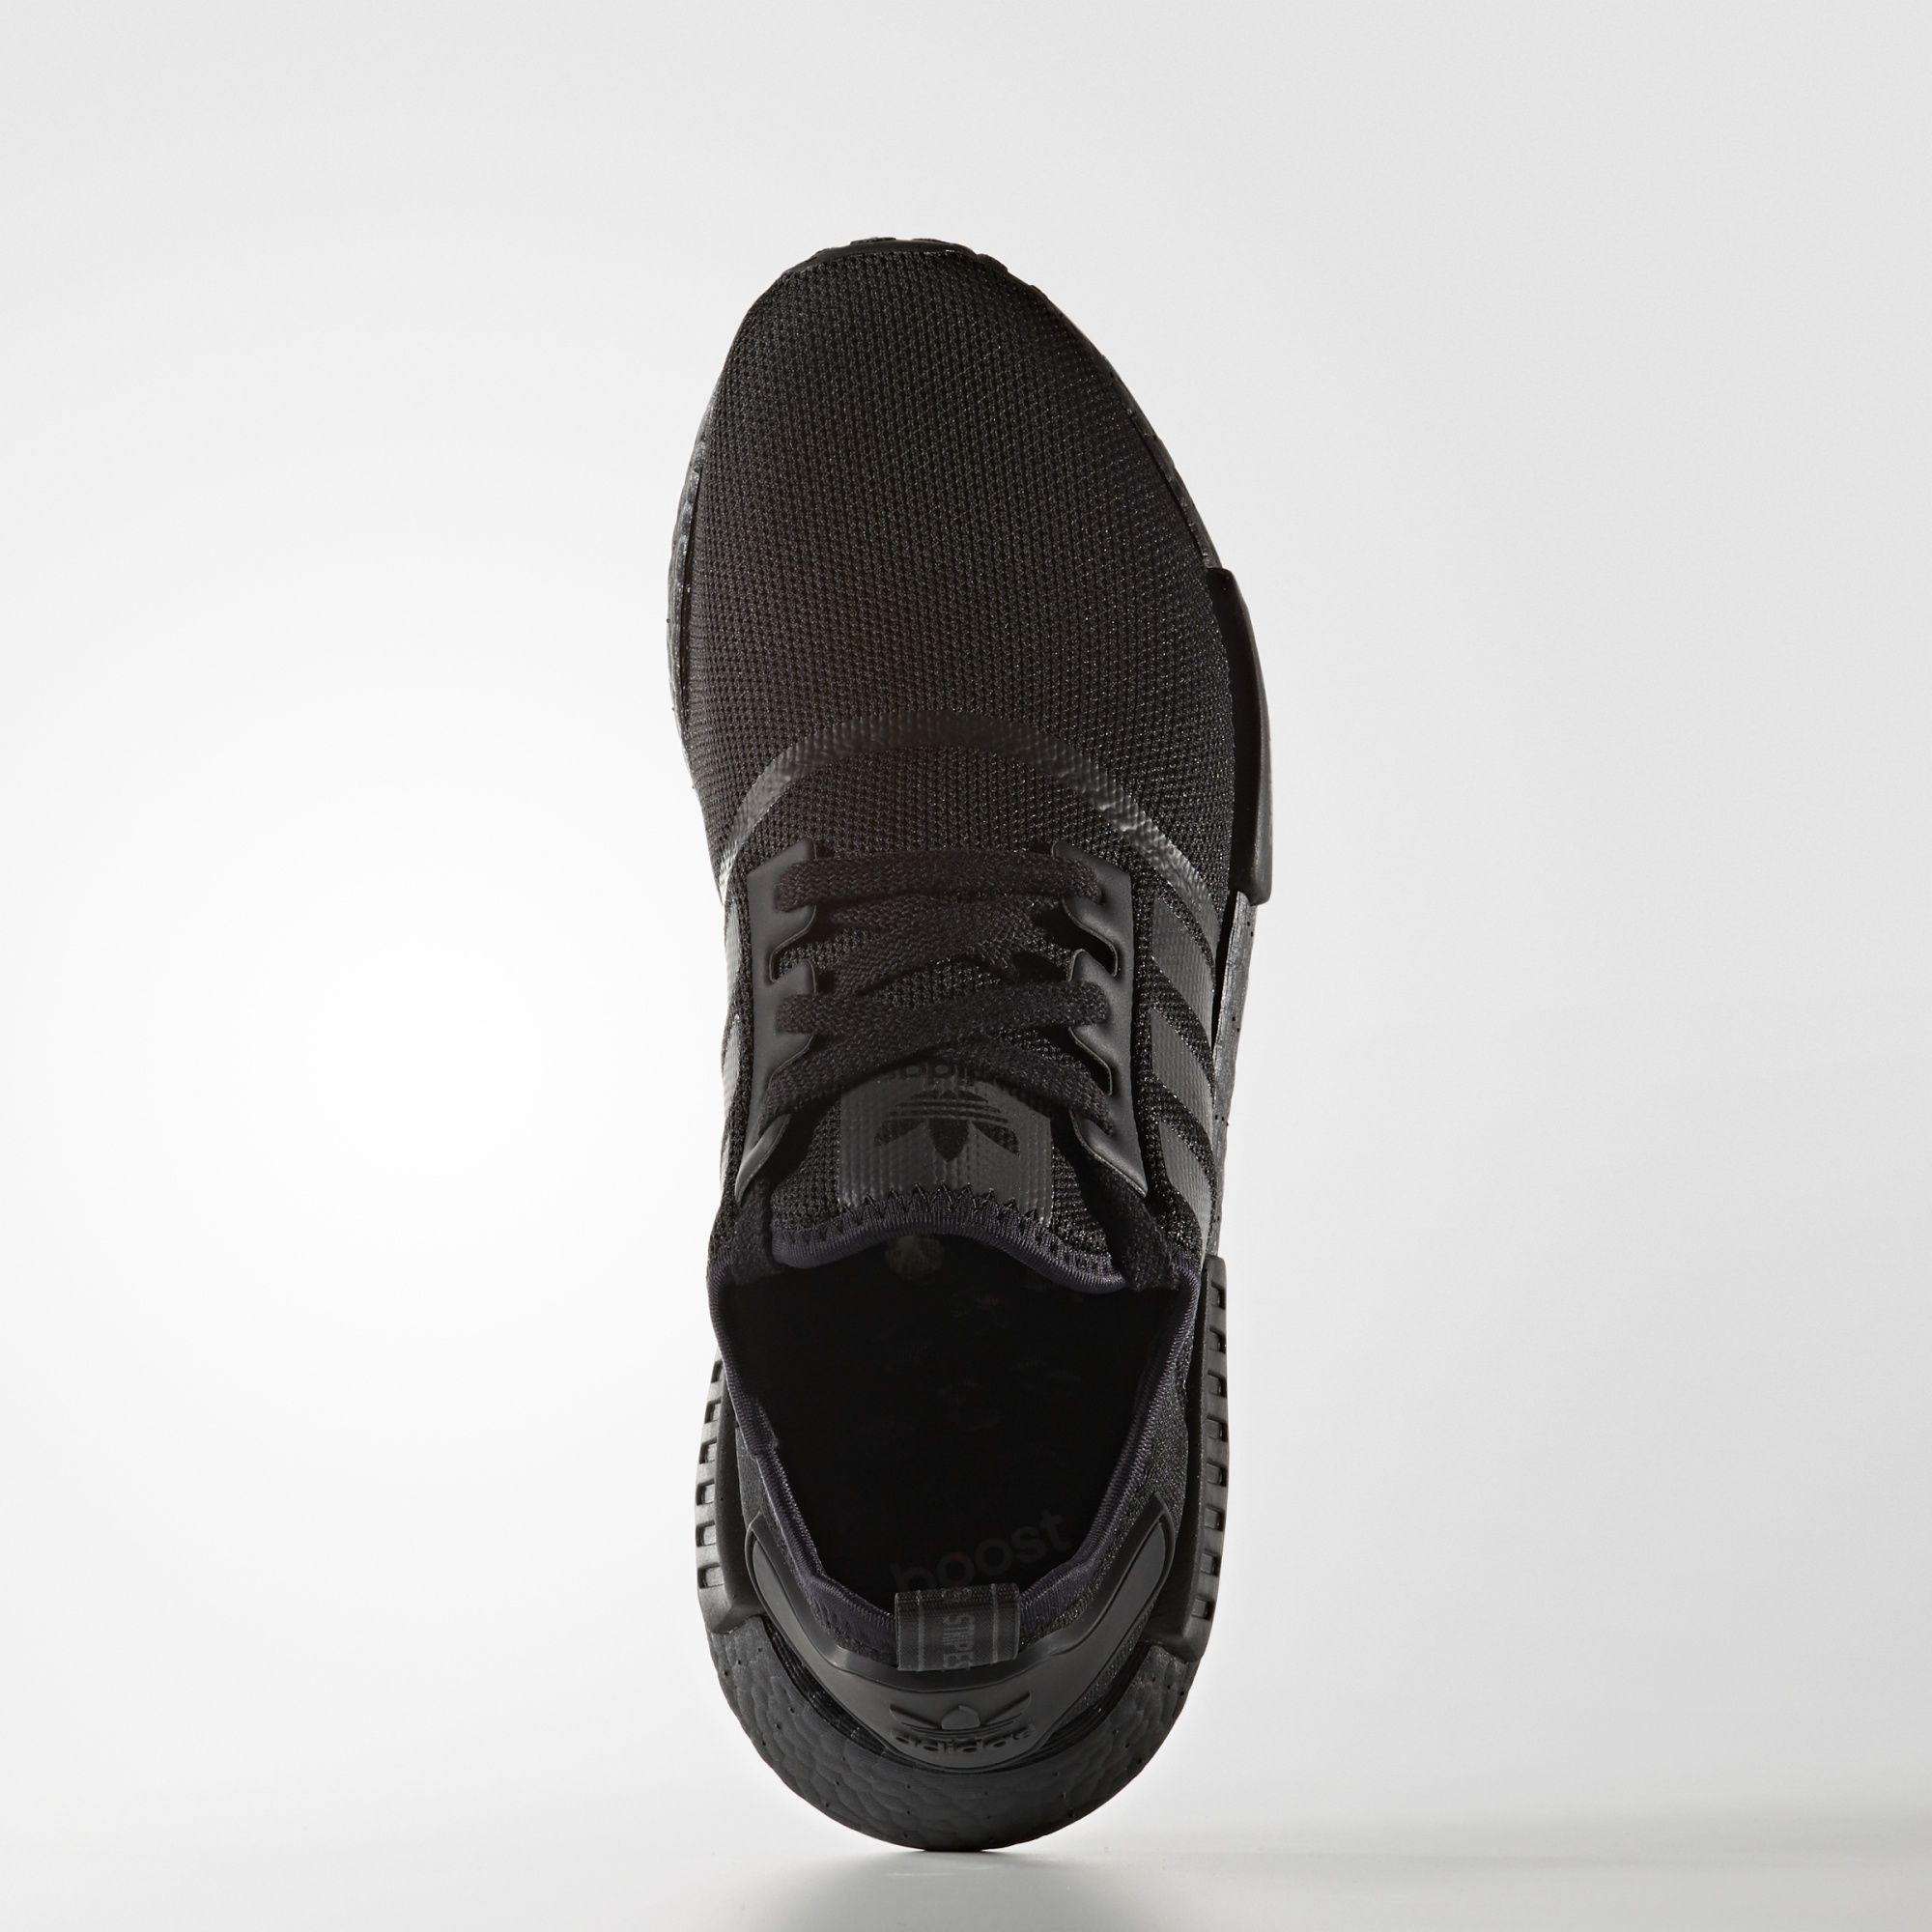 c628df43e adidas-nmd-r1-s31508-triple-black-2 – Housakicks